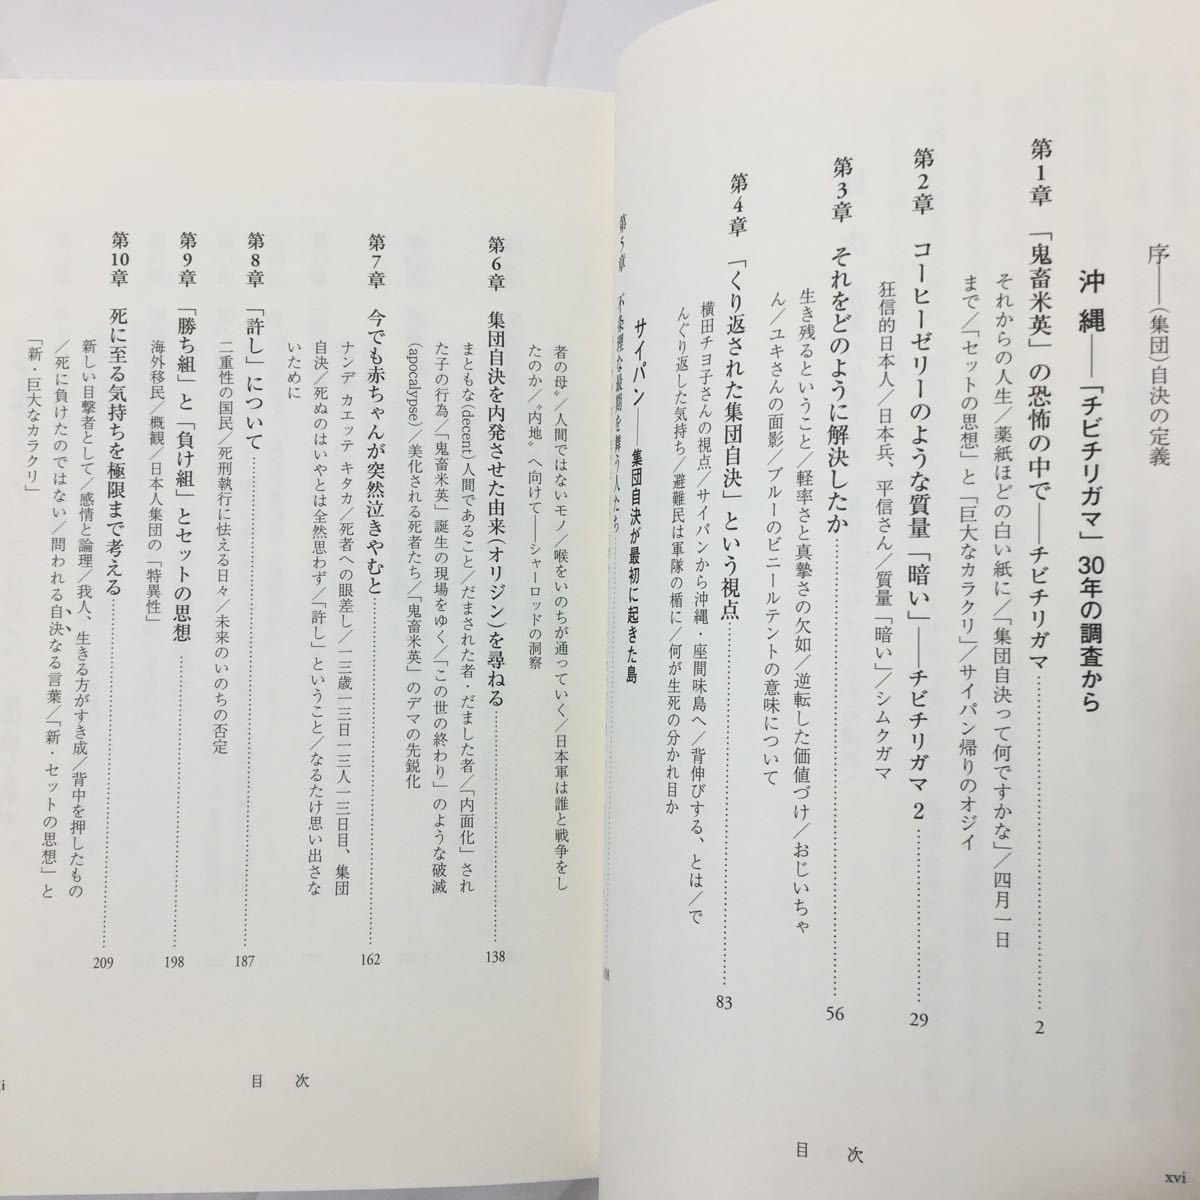 zaa-10 非業の生者たち――集団自決 サイパンから満洲へ 下嶋 哲朗 (著) 単行本 2012/5/31